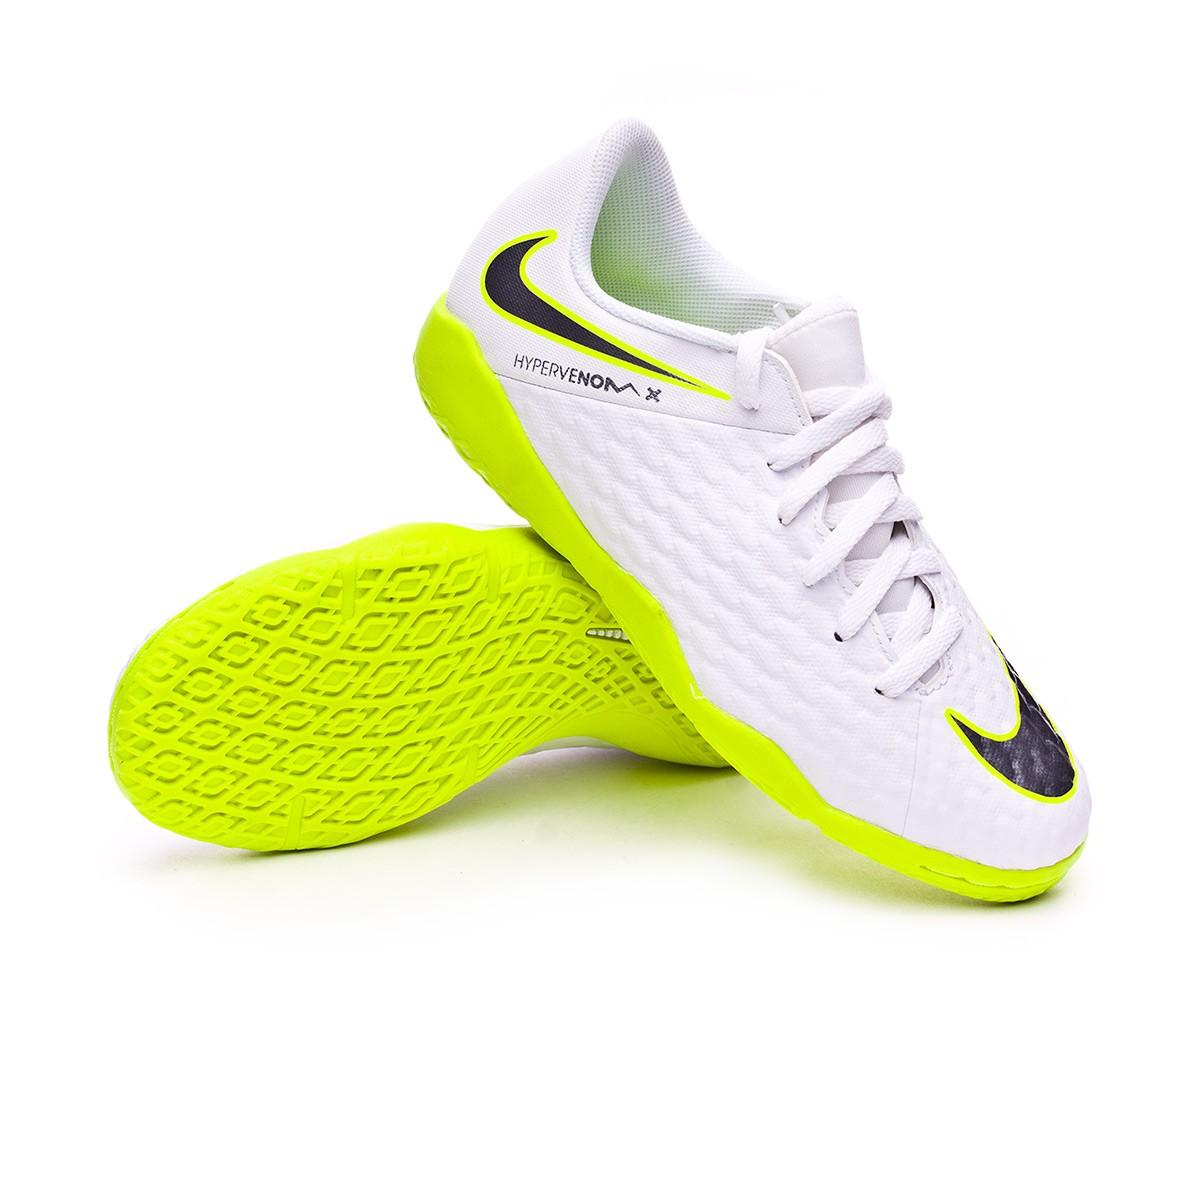 636d1d664 Futsal Boot Nike Kids Hypervenom PhantomX III Academy IC White ...